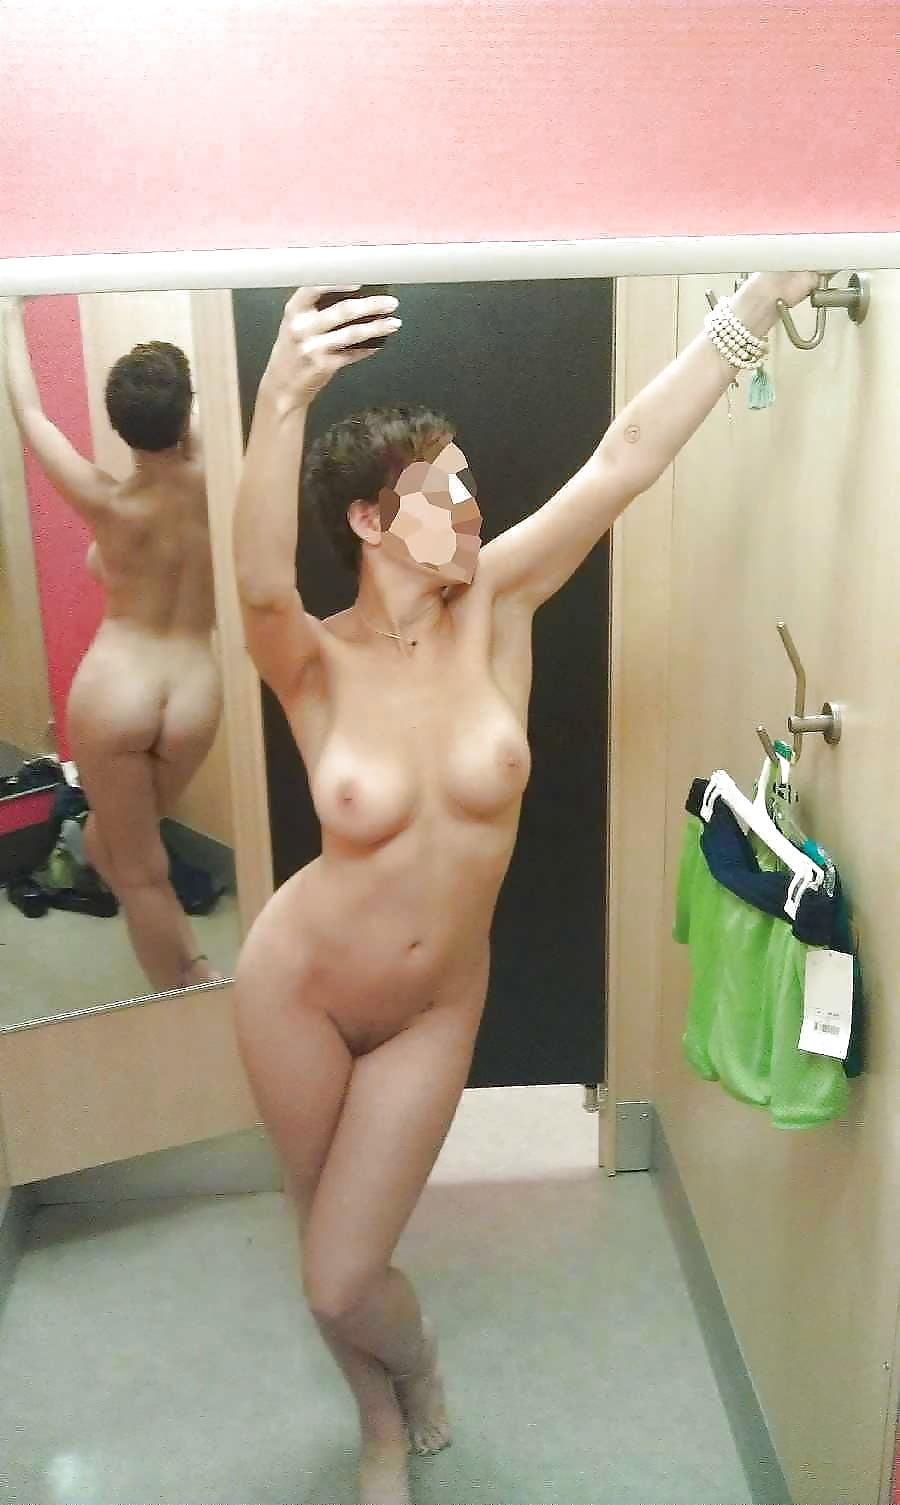 girls-change-rooms-pics-fake-porn-christina-hendricks